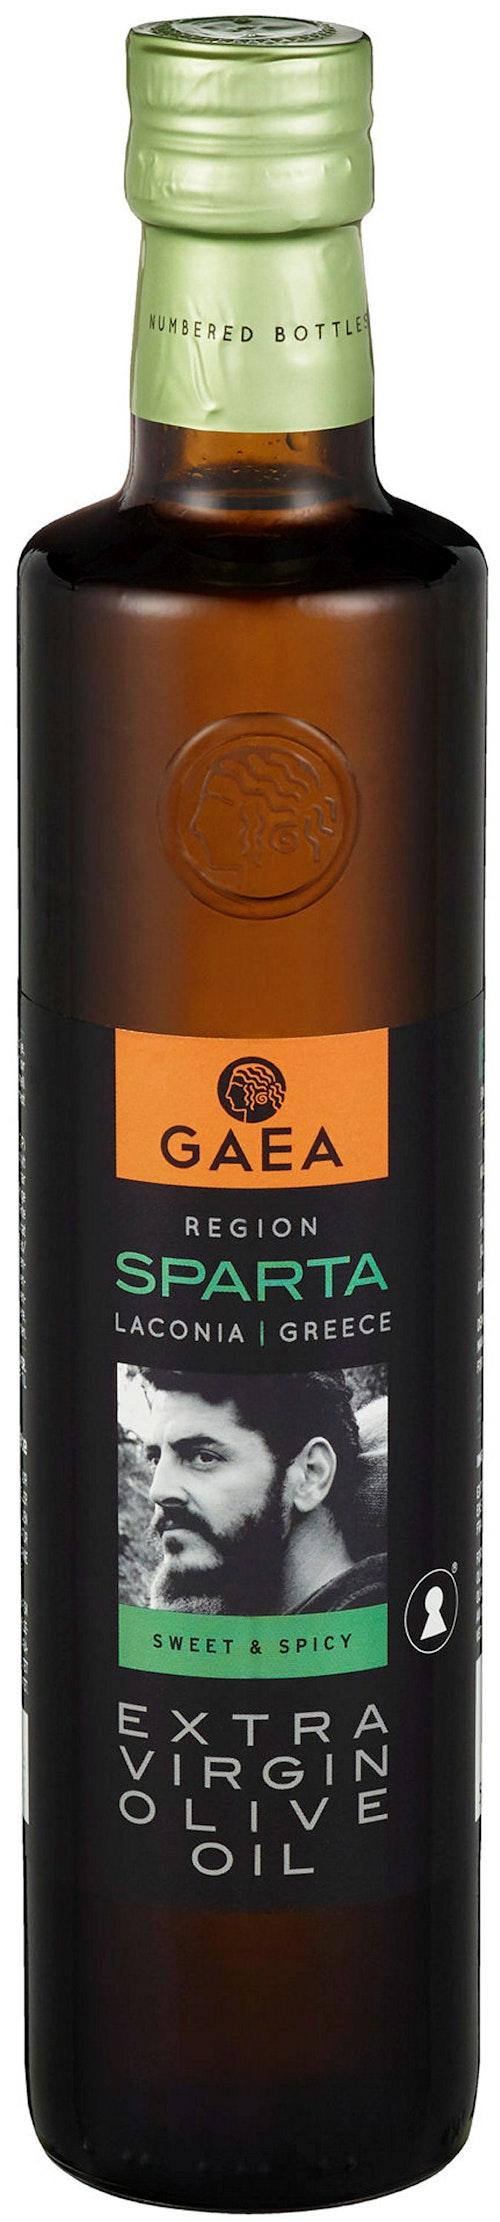 Gaea Region Sparta Extra Virgin Olive Oil 500 ml